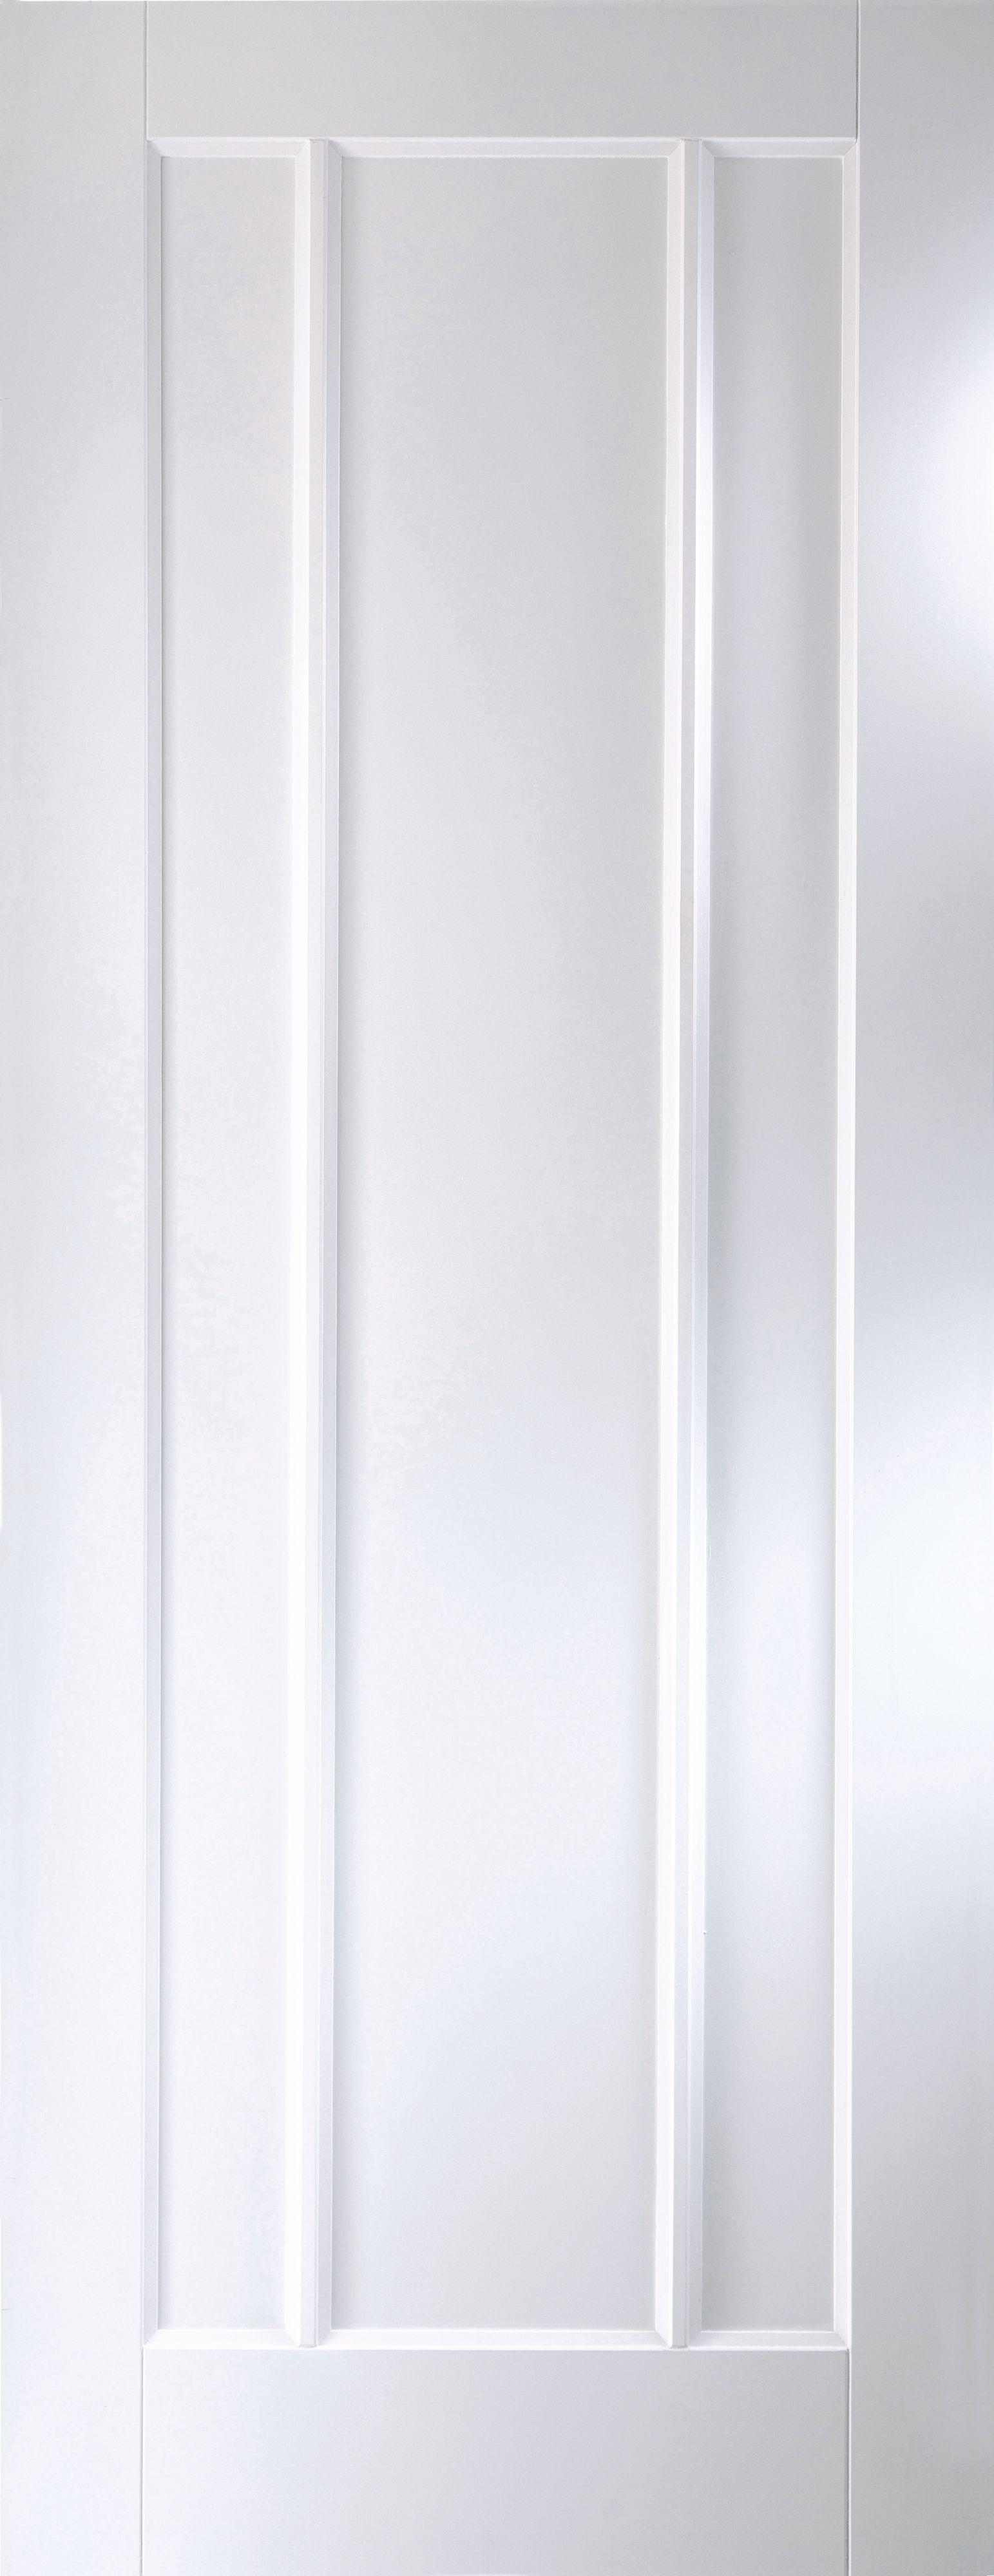 Vertical 3 Panel Primed Smooth Unglazed Internal Standard Door, (h)1981mm (w)686mm